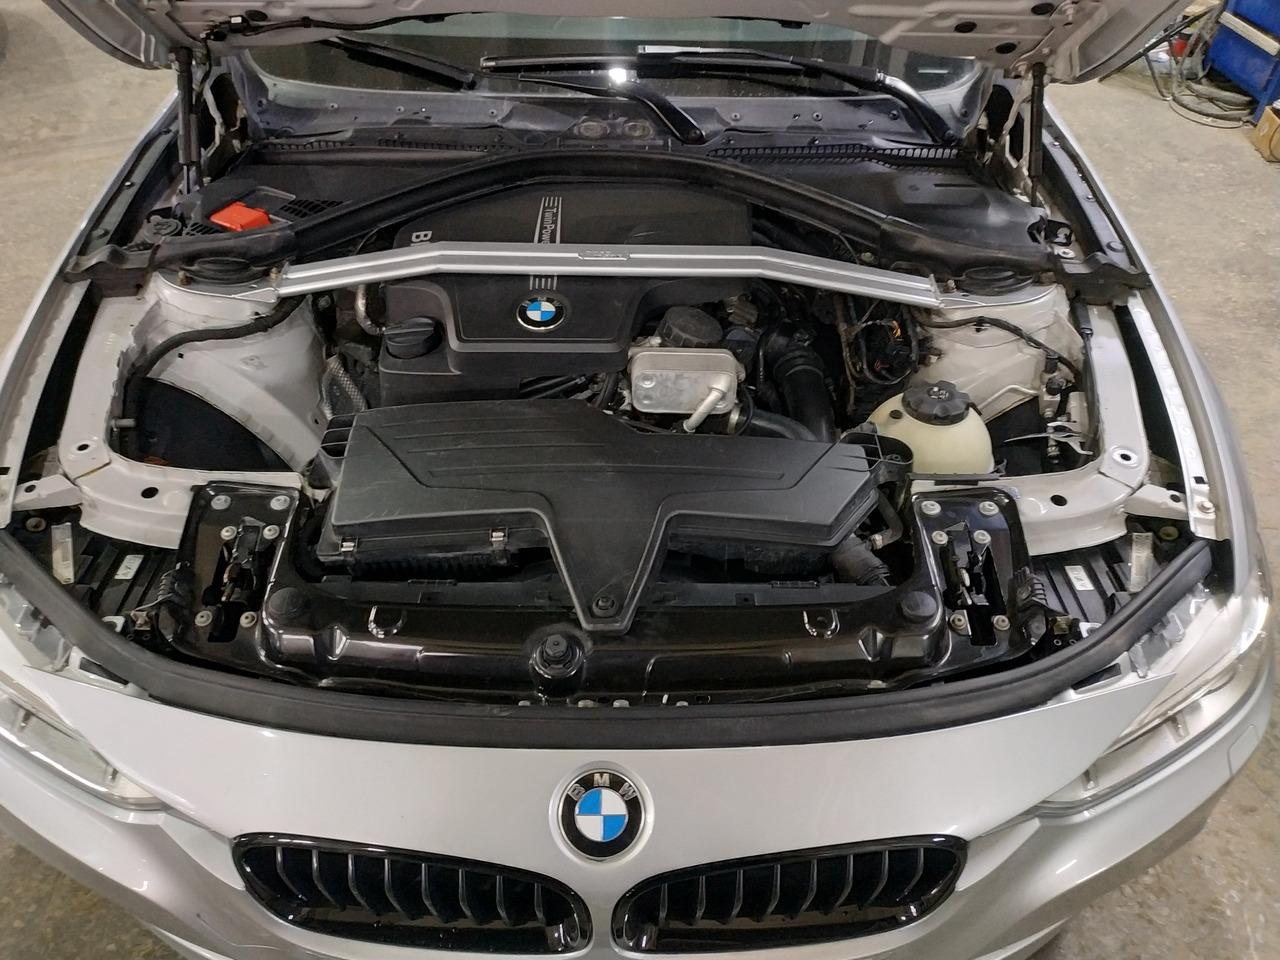 BMW F30, прошивка 320 в 328